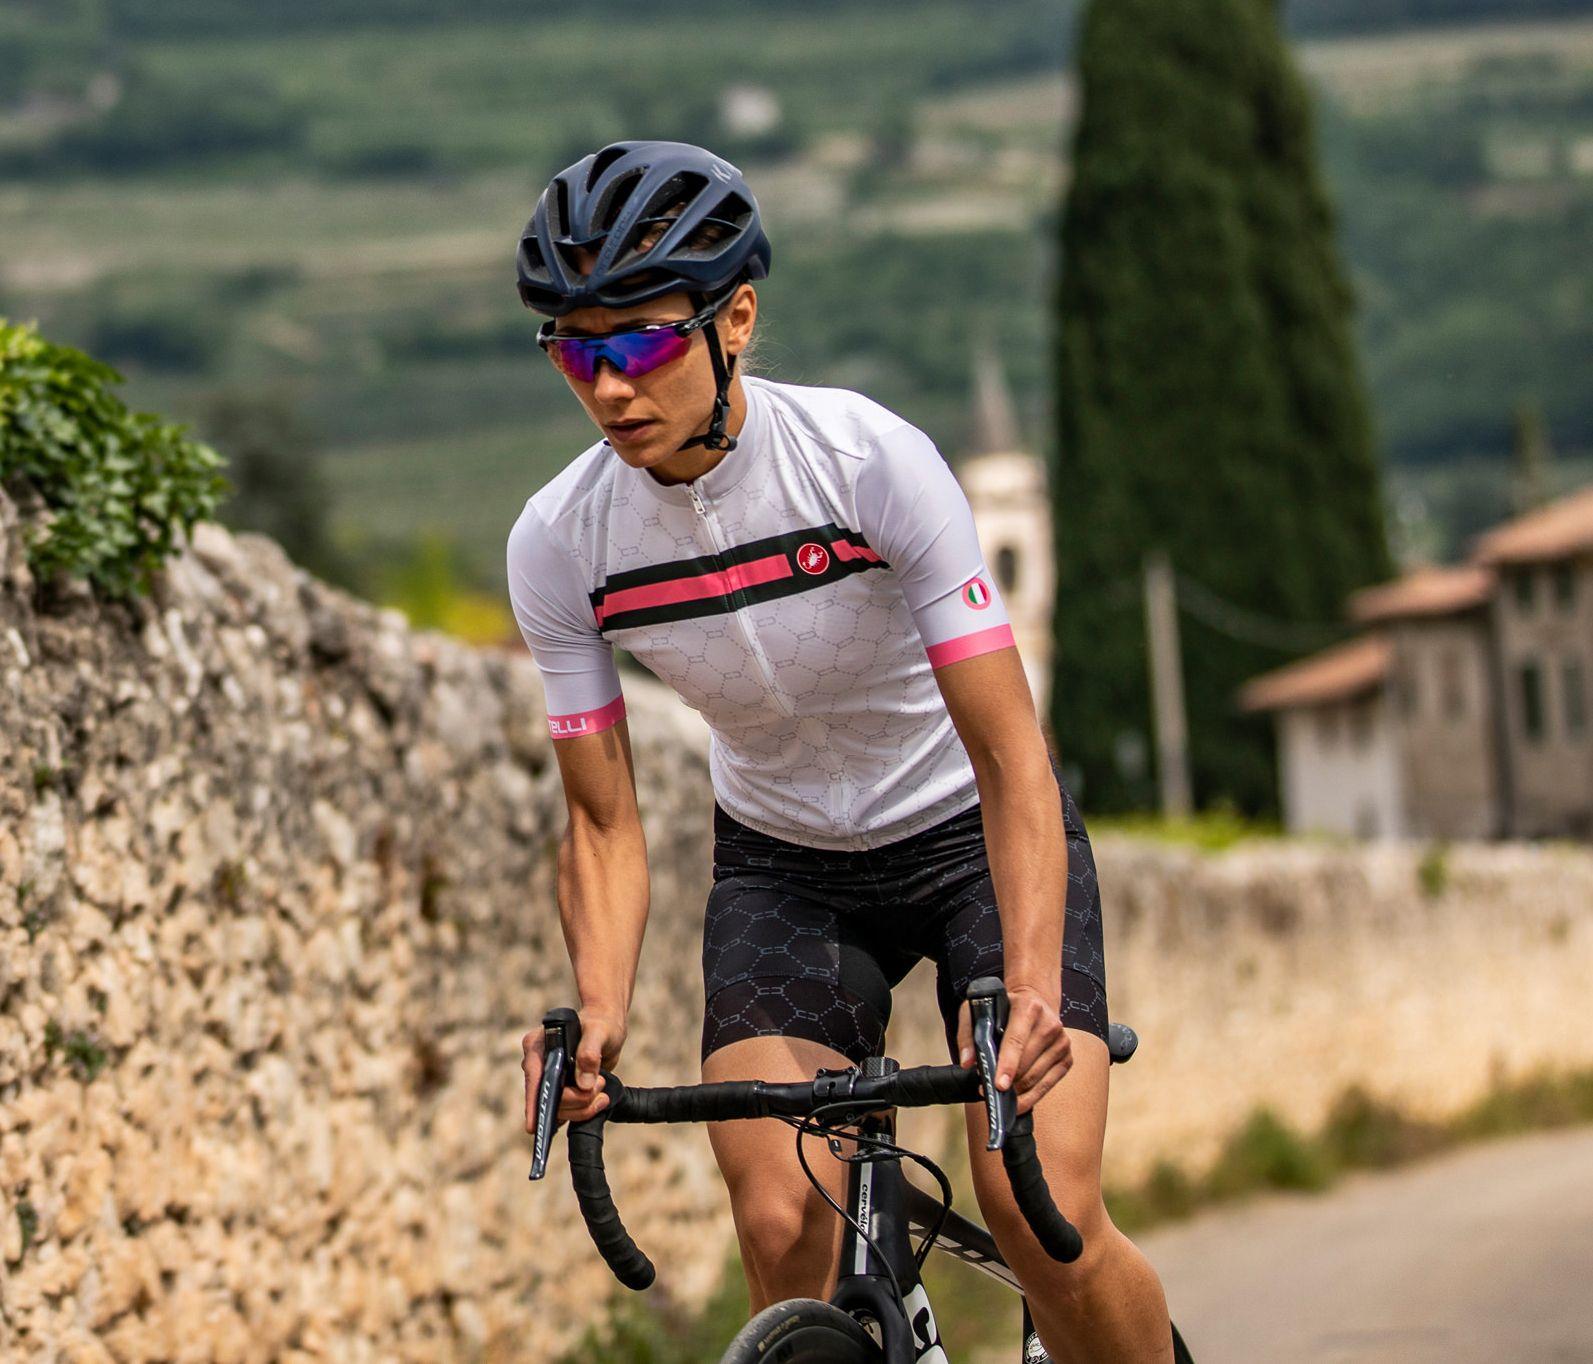 Castelli Atelier fietsshirt